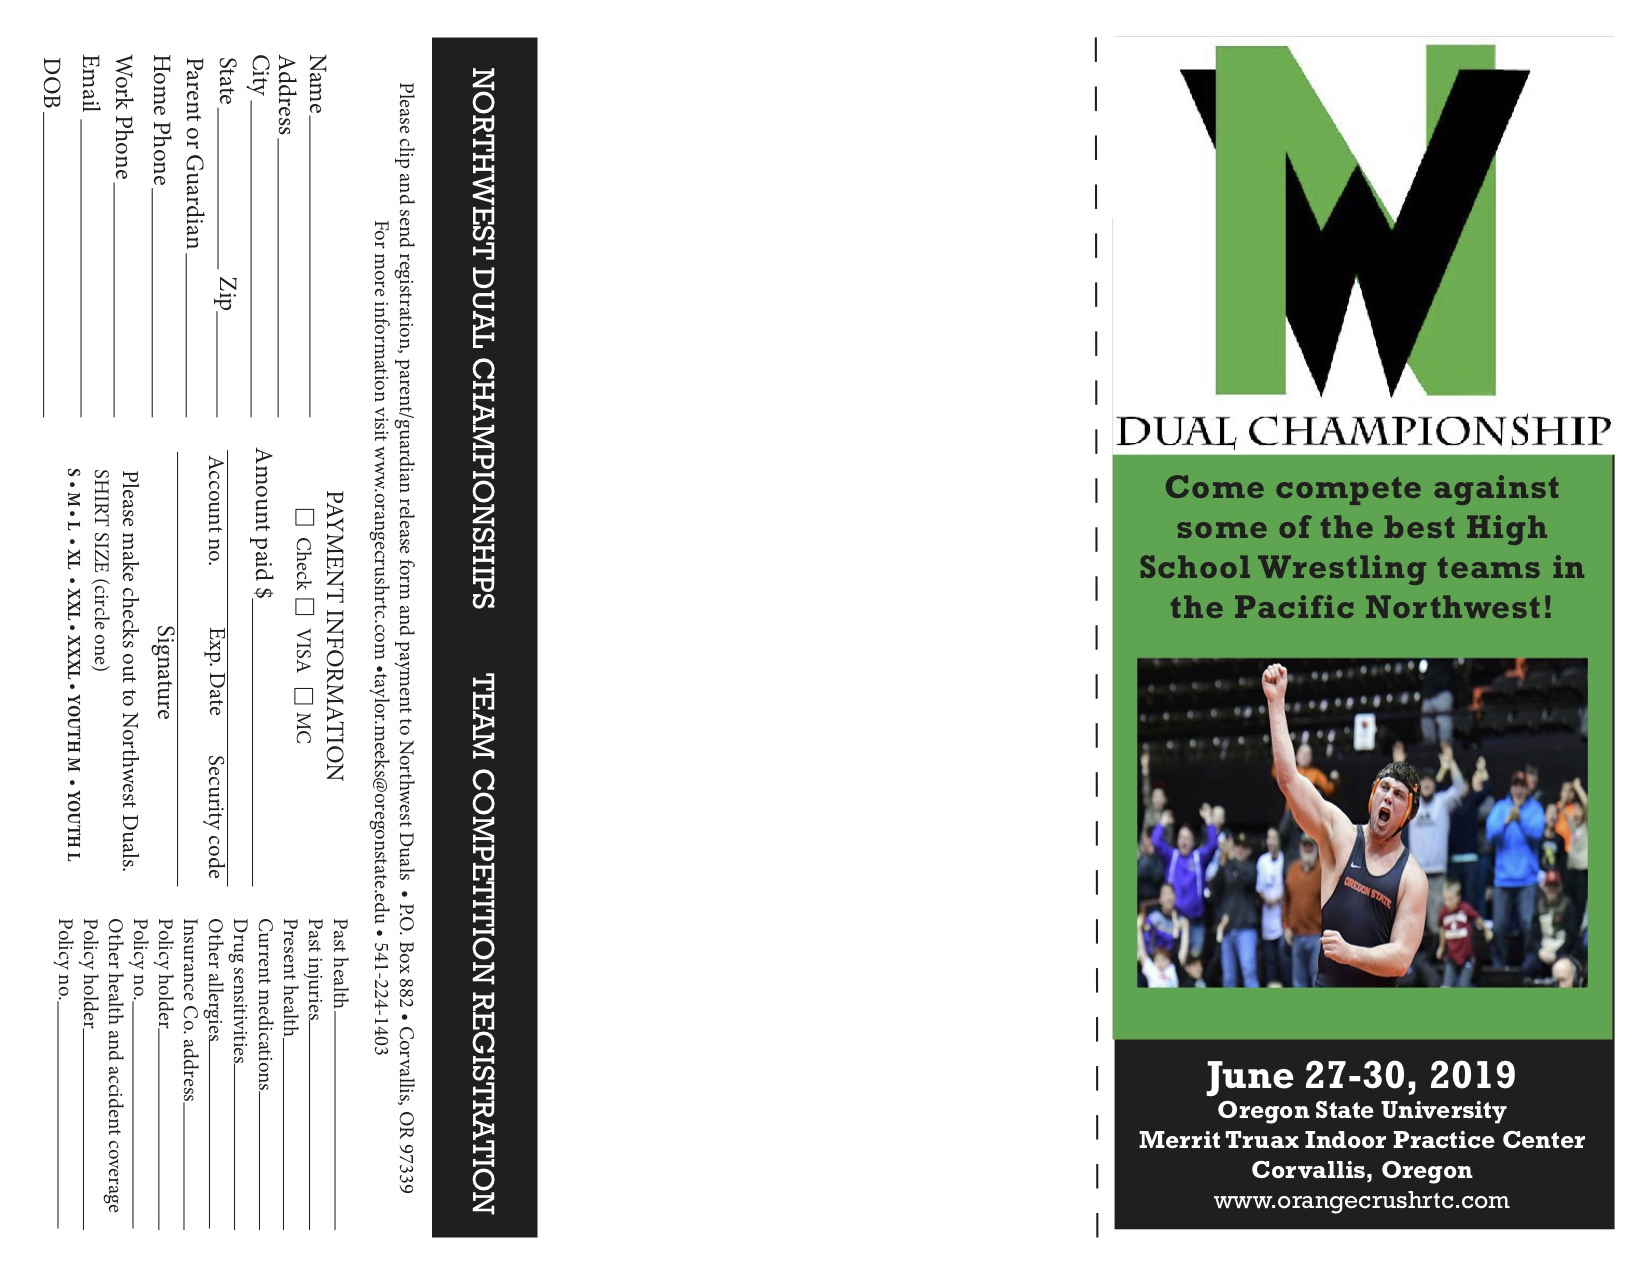 NW dual championship 2019 copy.jpg